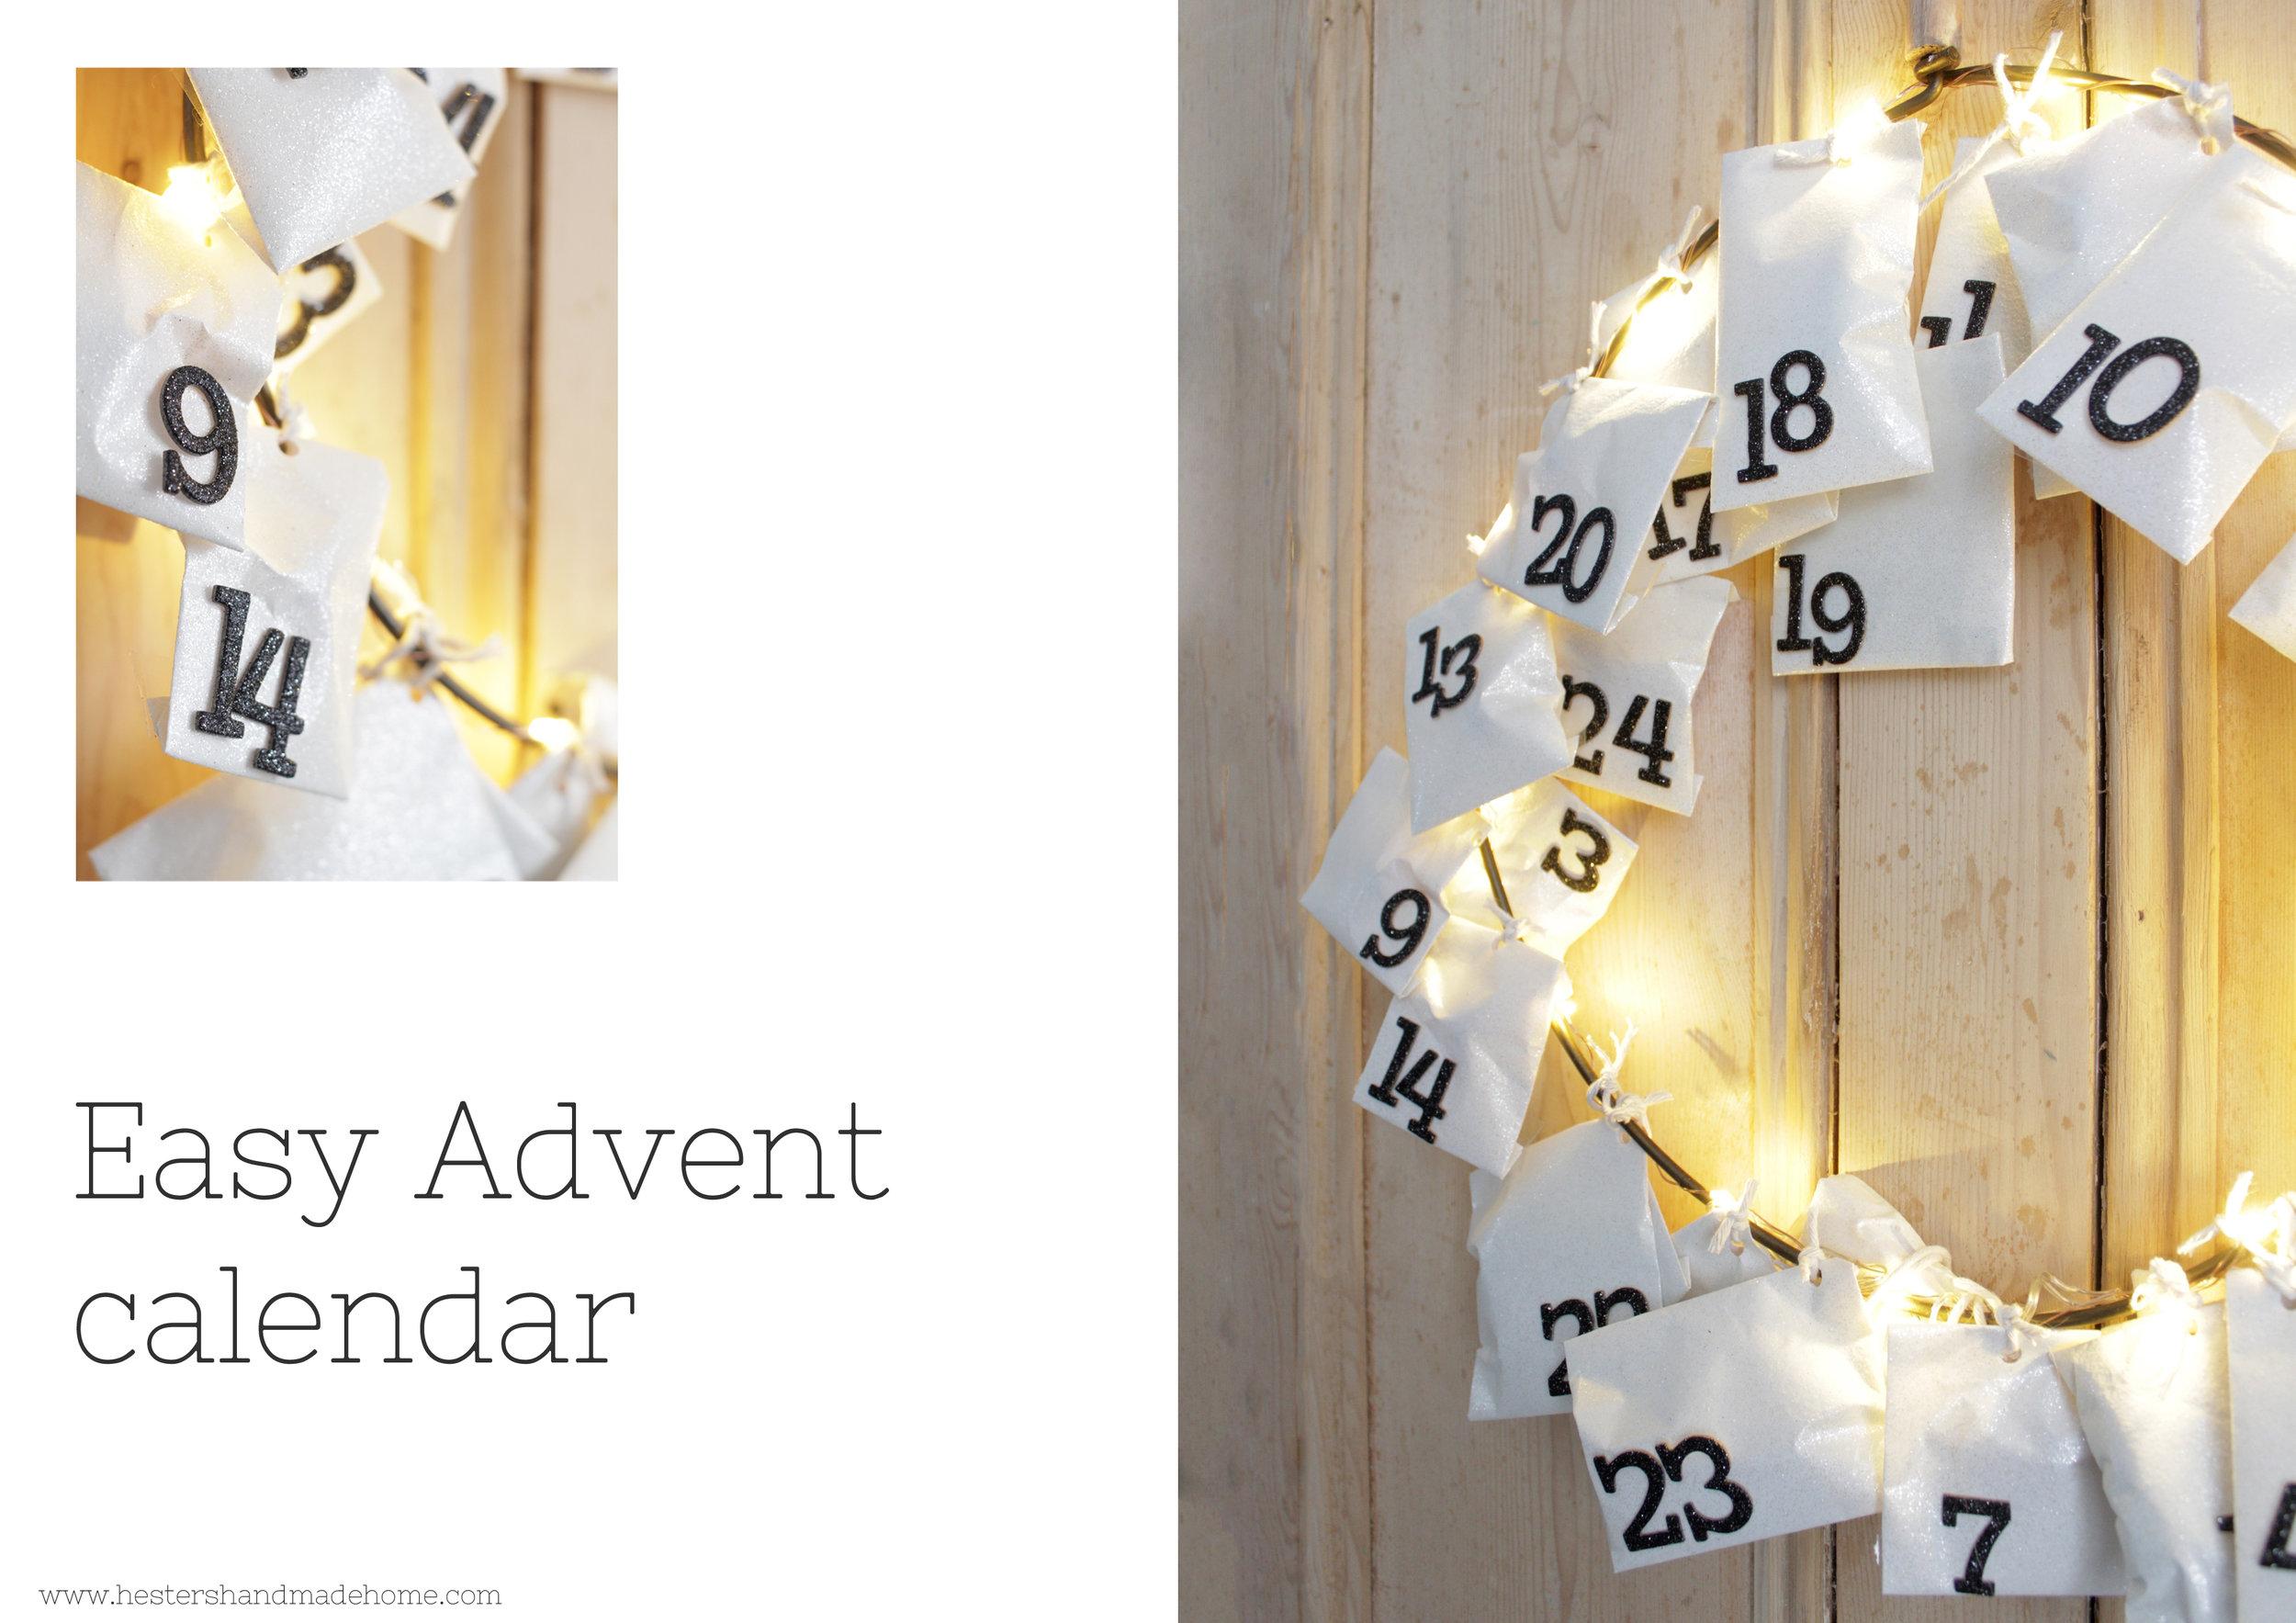 Easy make advent calendar by www.hestershandmadehome.com